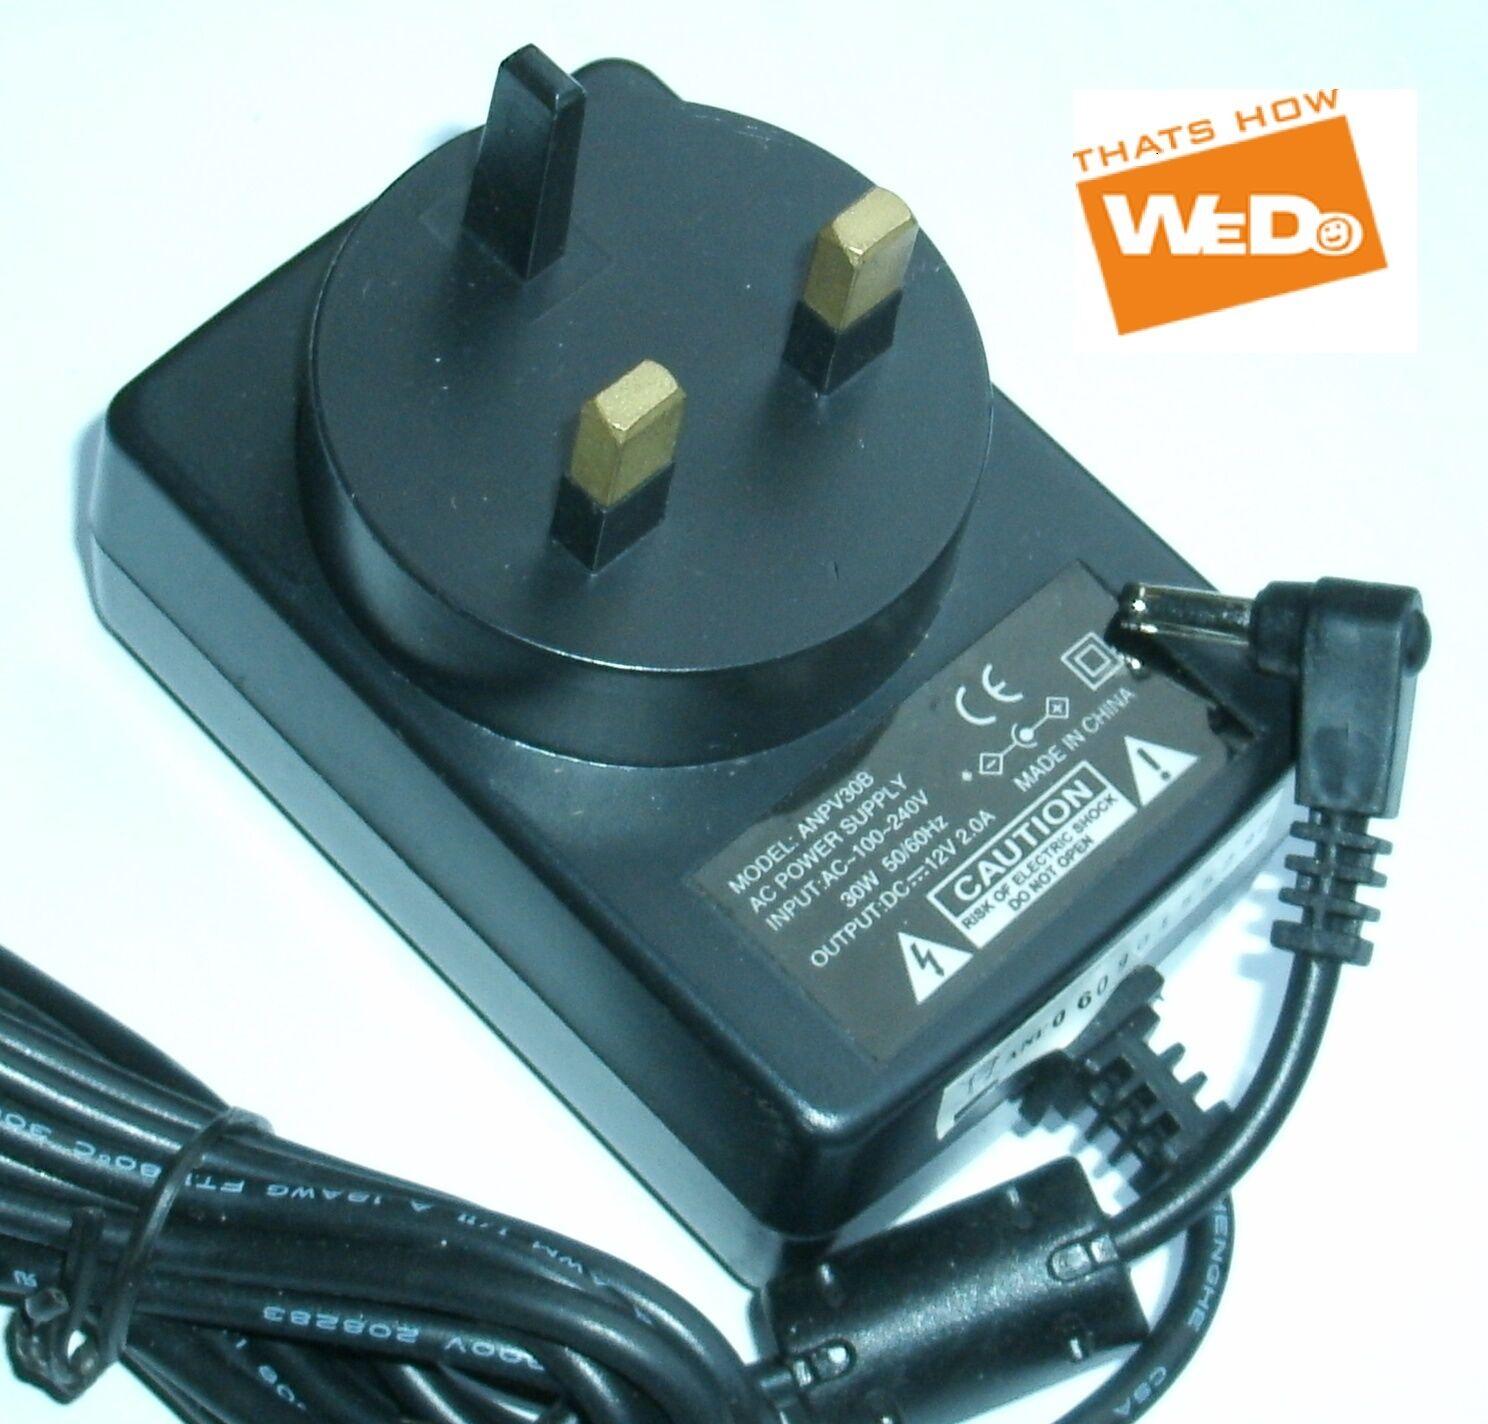 POWER SUPPLY ANPV30B DC 12V 2.0A UK PLUG [282395056990] - $15.99 ...